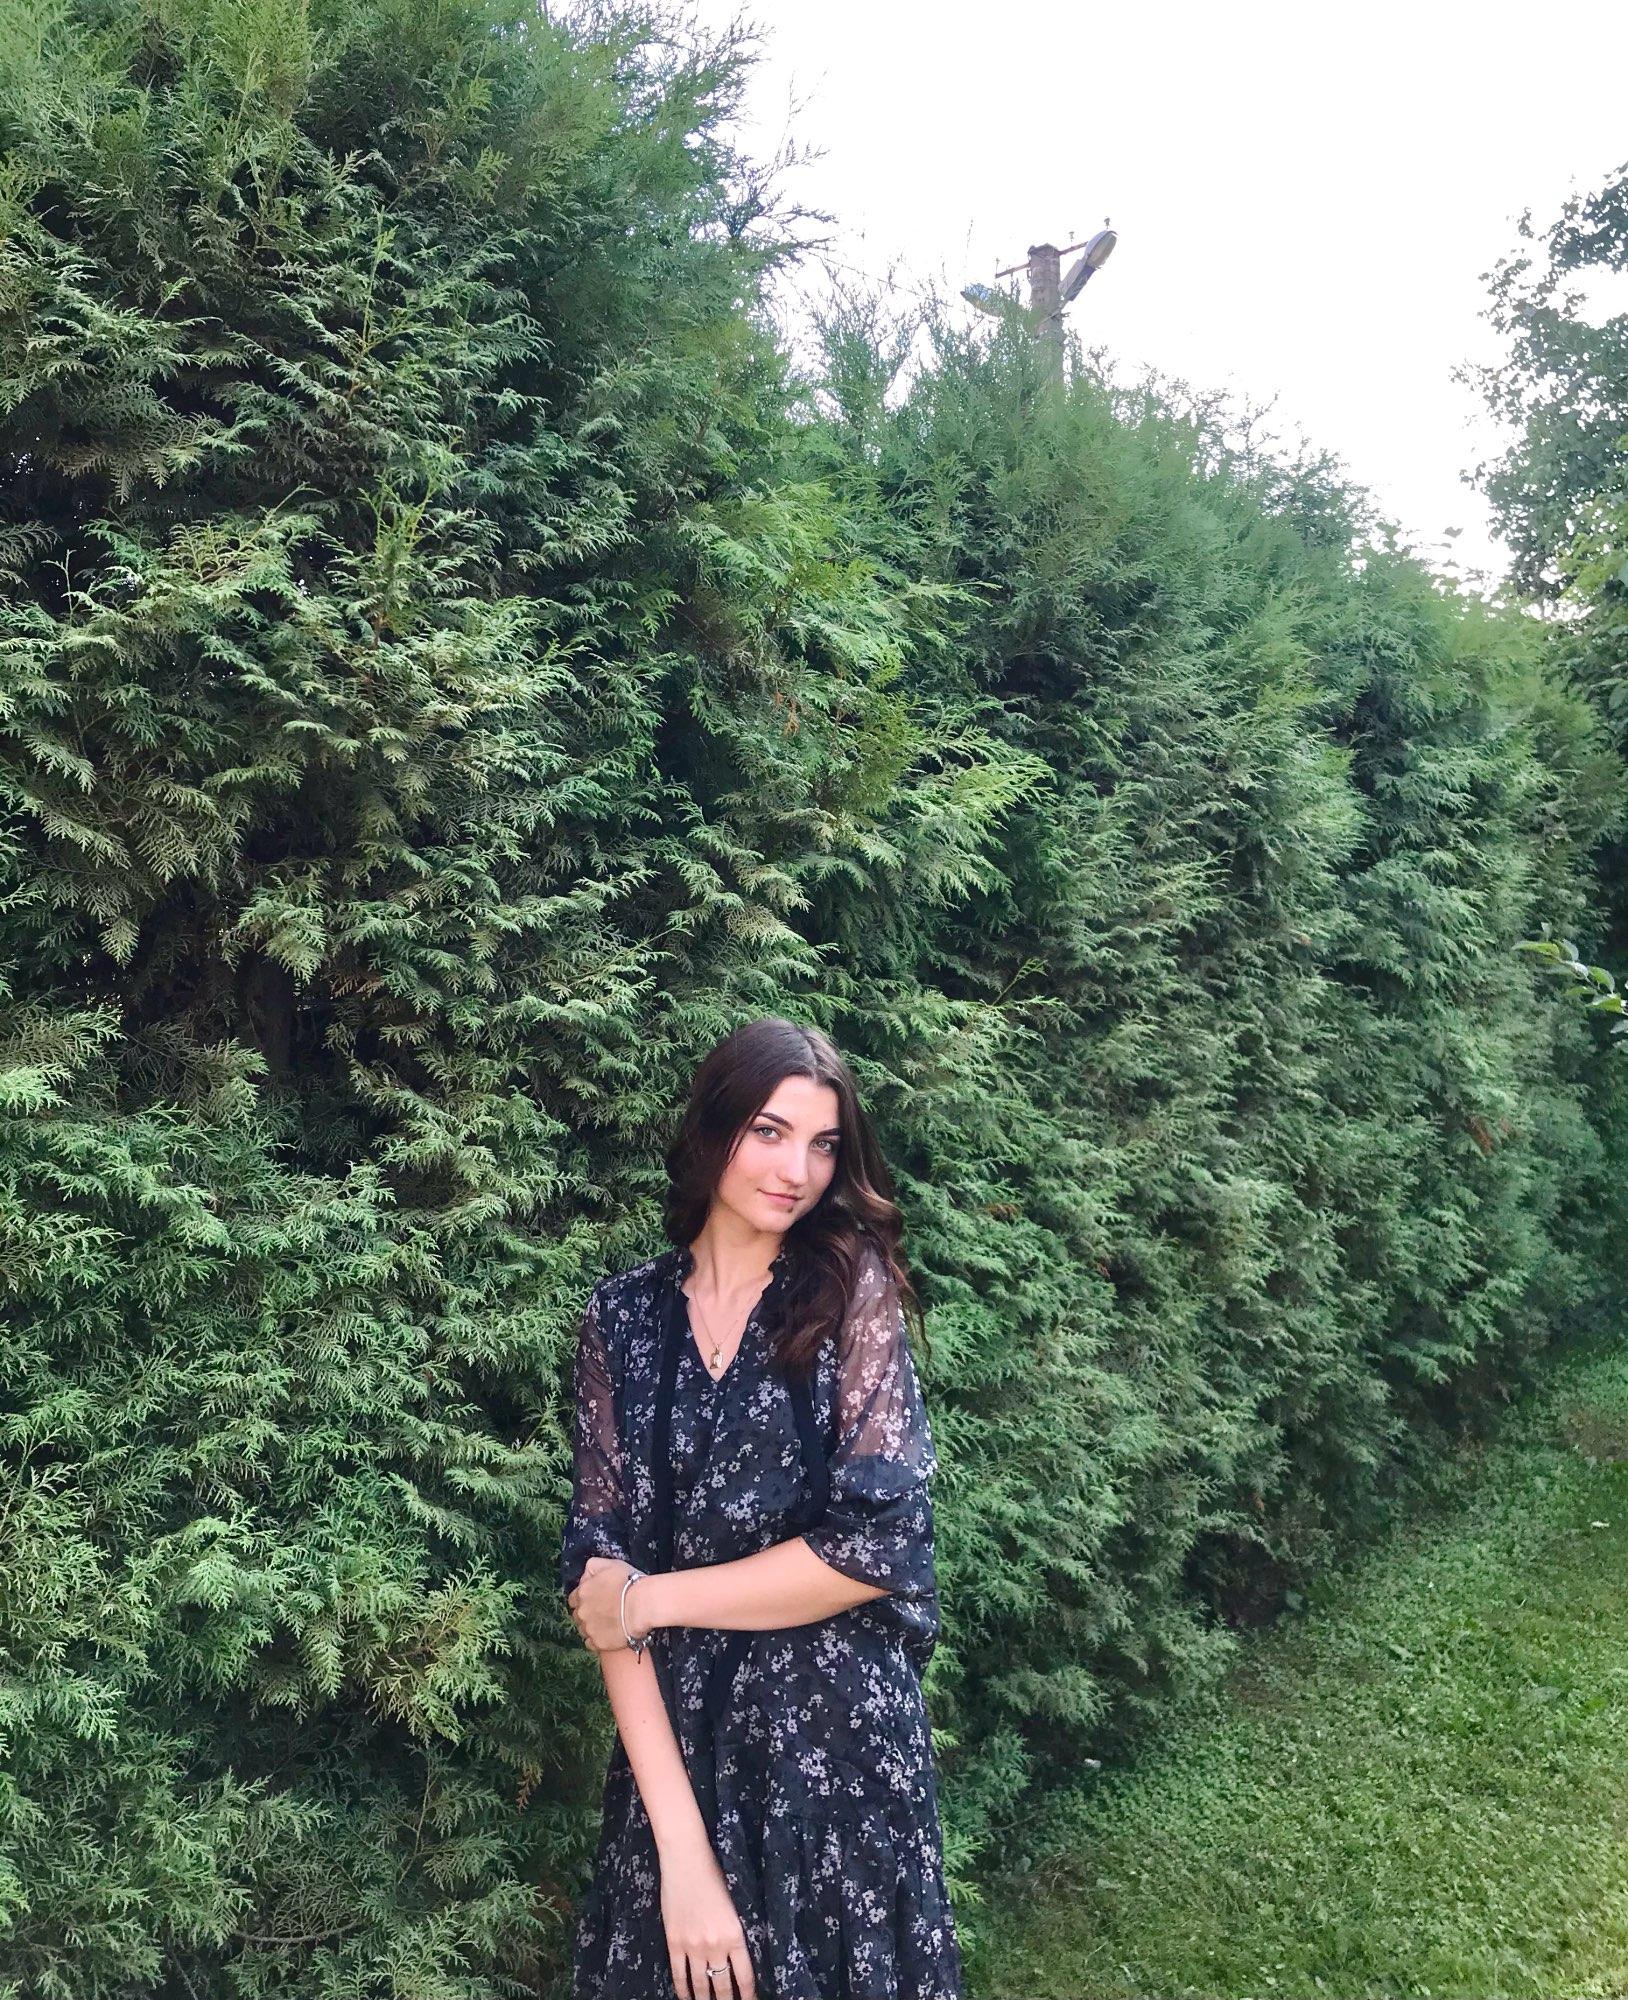 Aachoae Women Ruffle Bow Tie Mini Floral Print Dress Vintage Long Sleeve Casual Loose Pleated Dress Ruffles Party Dress Vestidos|Dresses|   - AliExpress